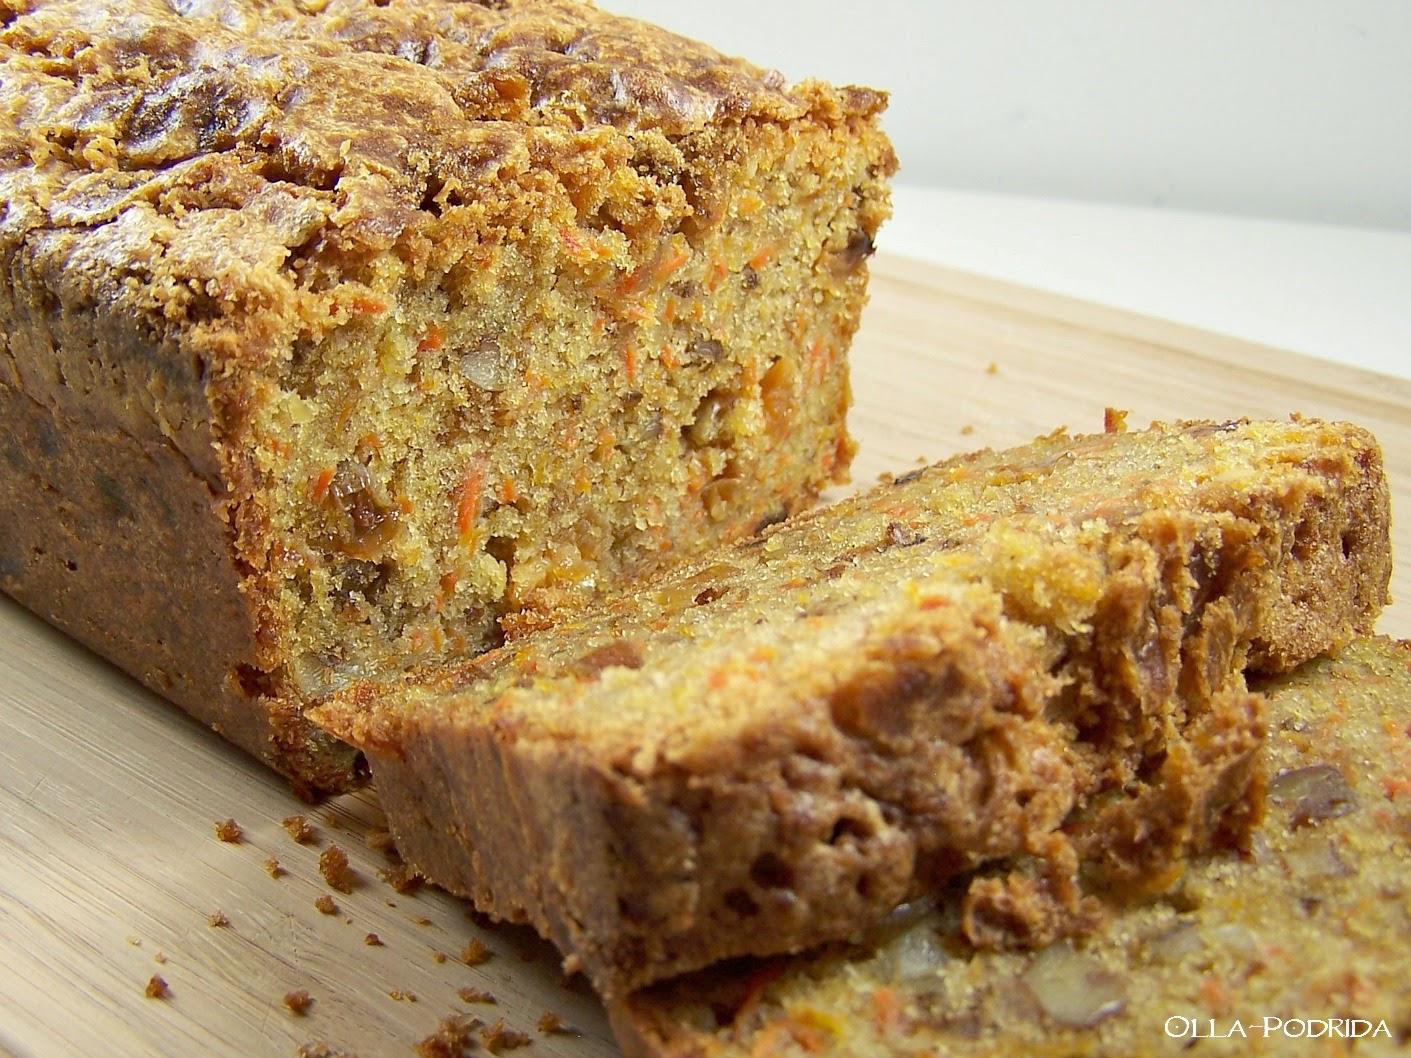 Carrot Cake Loaf All Recipes: Olla-Podrida: Carrot-Walnut Loaf Cake